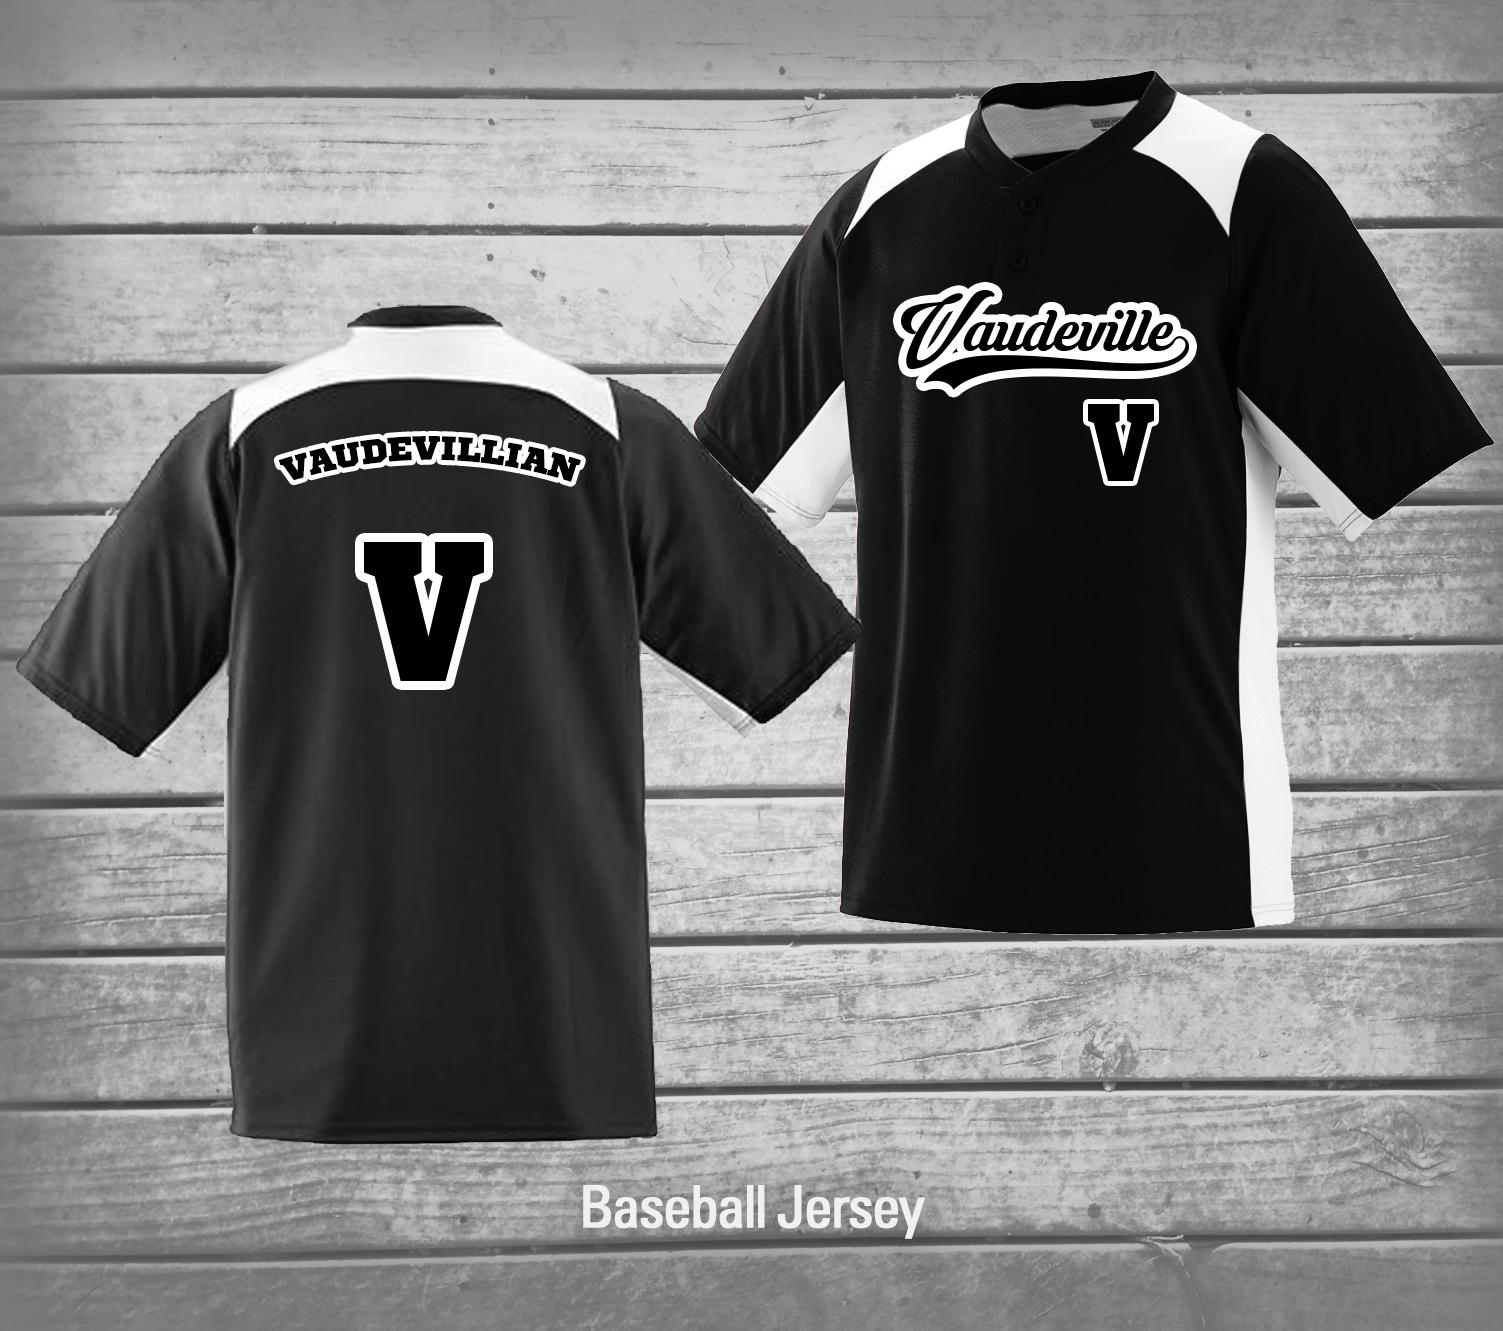 Baseball Jersey_Vaudeville.jpg